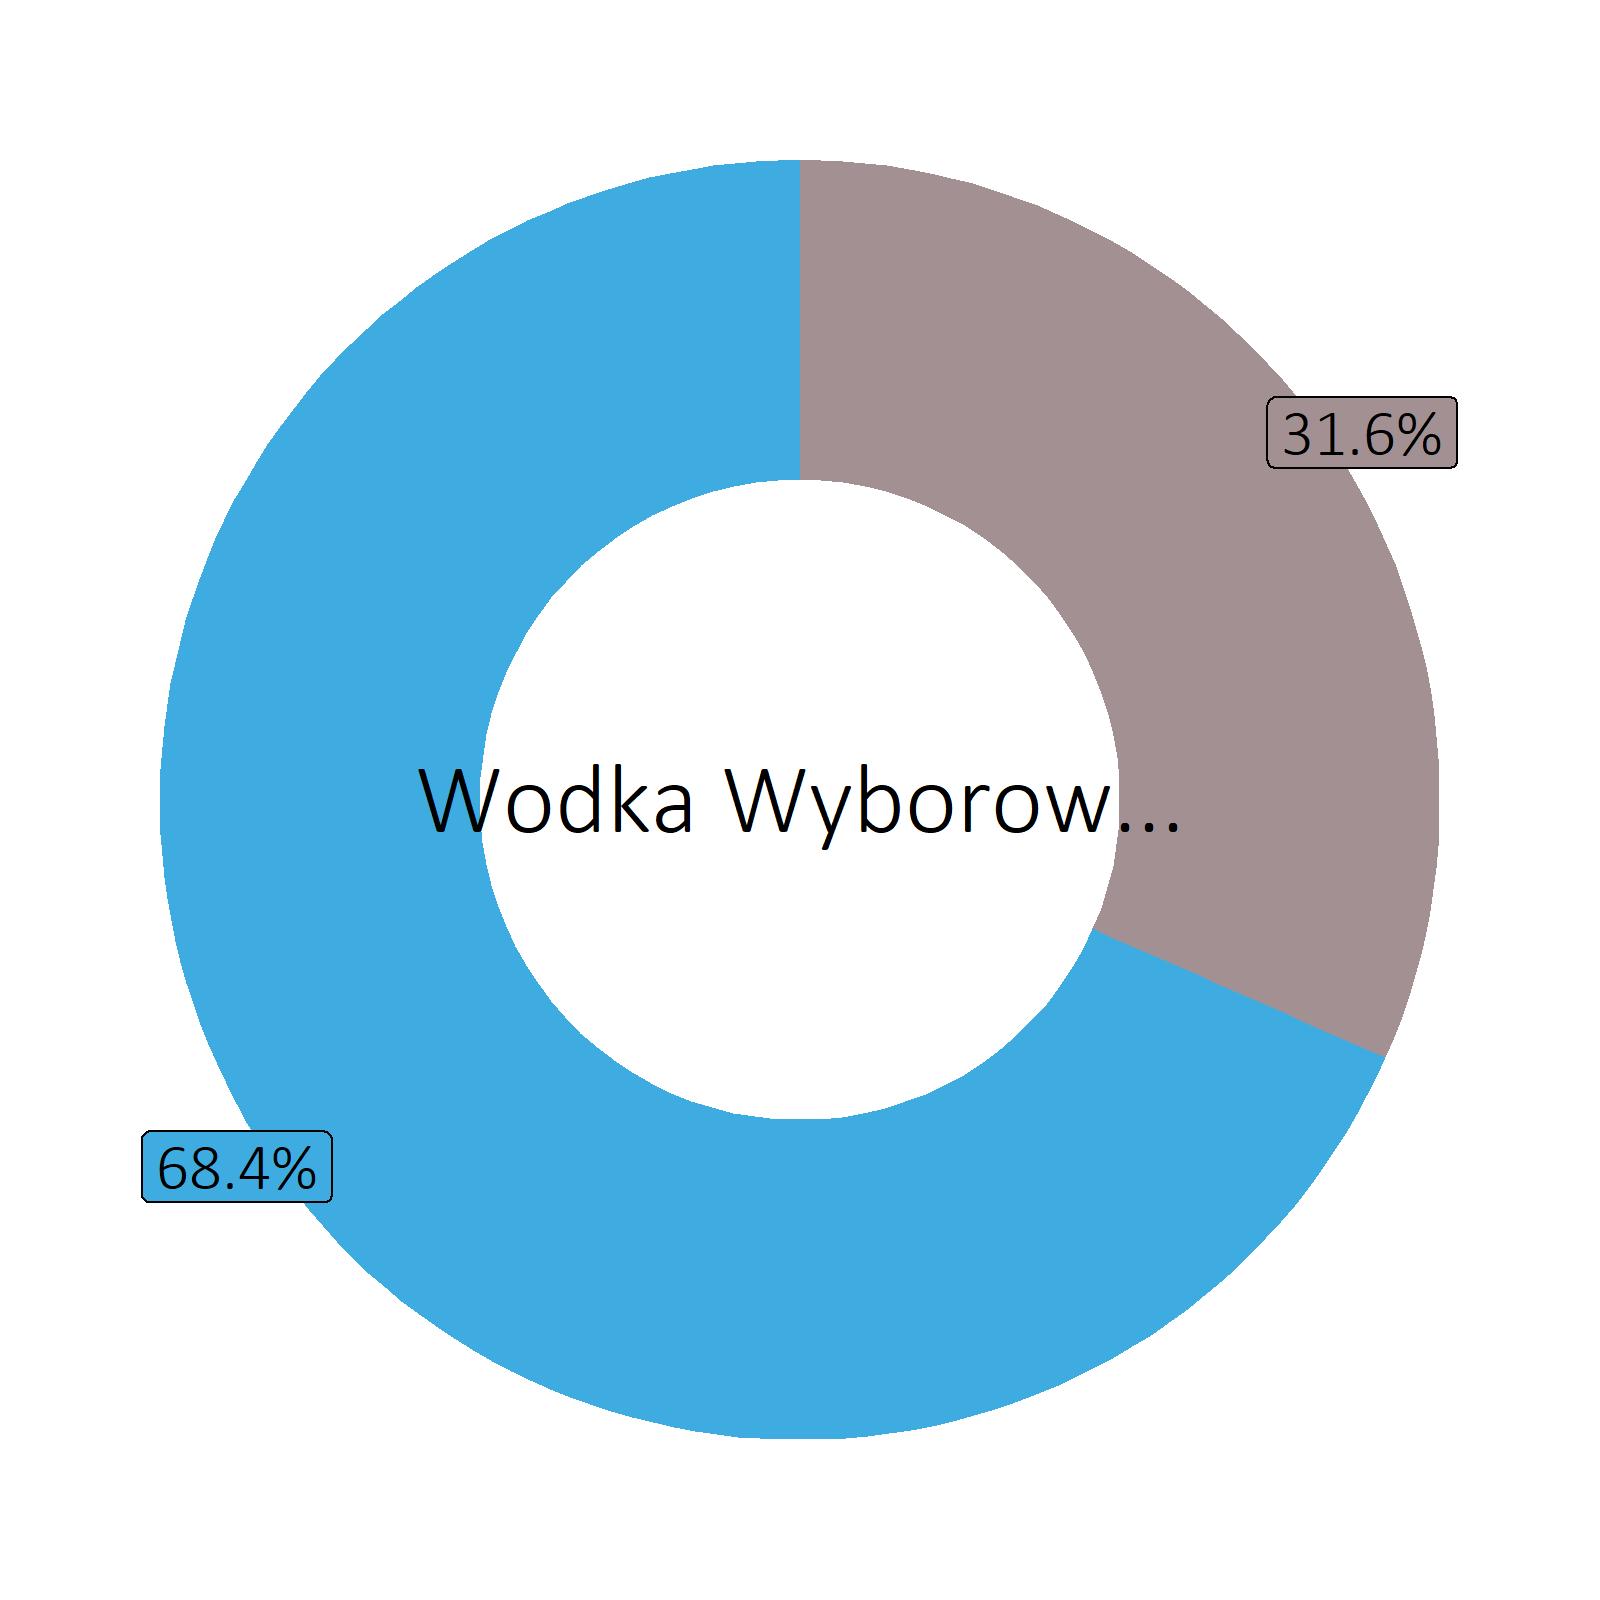 Bestandteile Wodka Wyborowa (40 vol%)